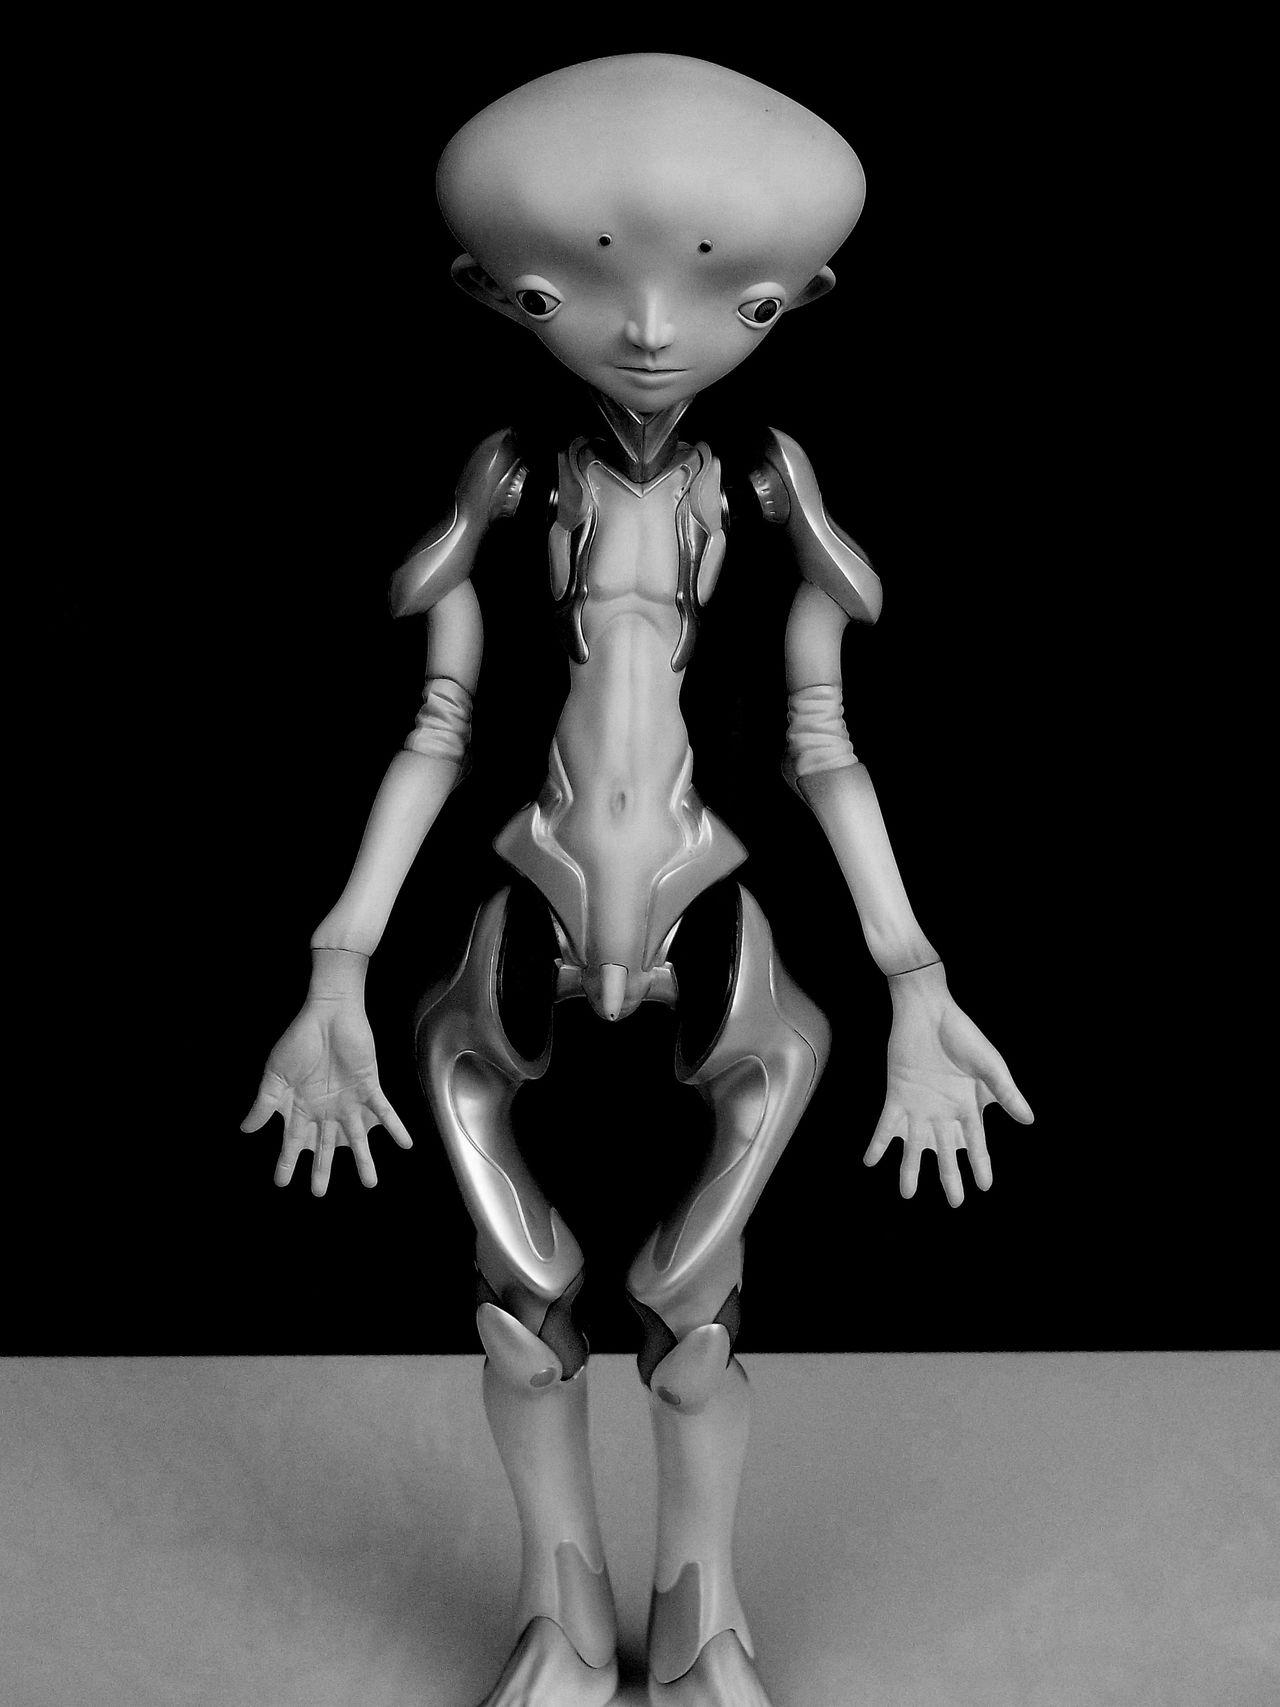 Alien Alieno Art Arte Better Look Twice Bianco E Nero Black And White Creativity EyeEm Best Shots EyeEm Gallery Grey Grigio Here Invasion Invasione Nohuman Sculpture Somethingstrange Strange Strano